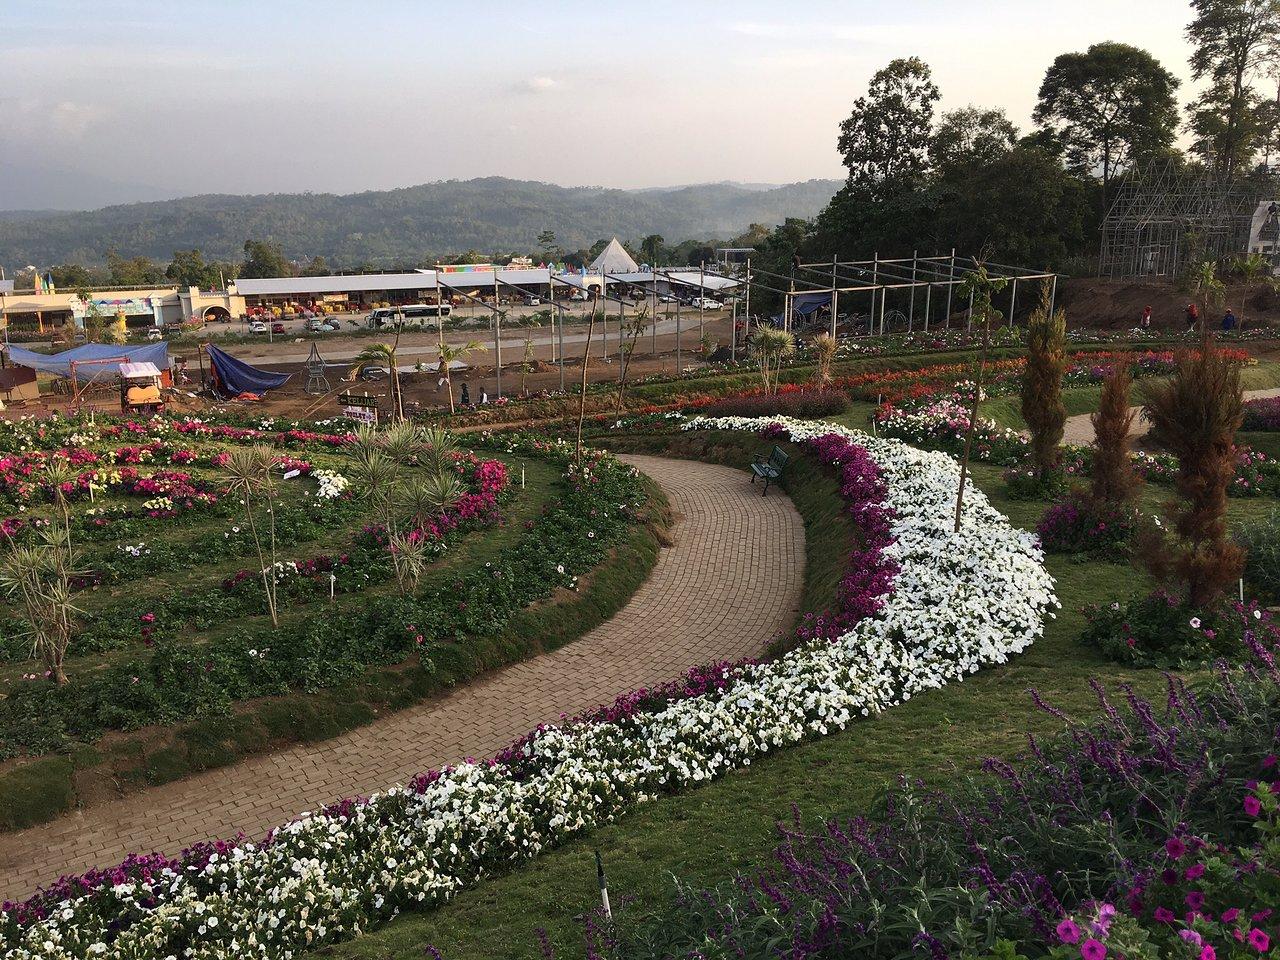 Celosia Flower Garden Bandungan 2020 All You Need To